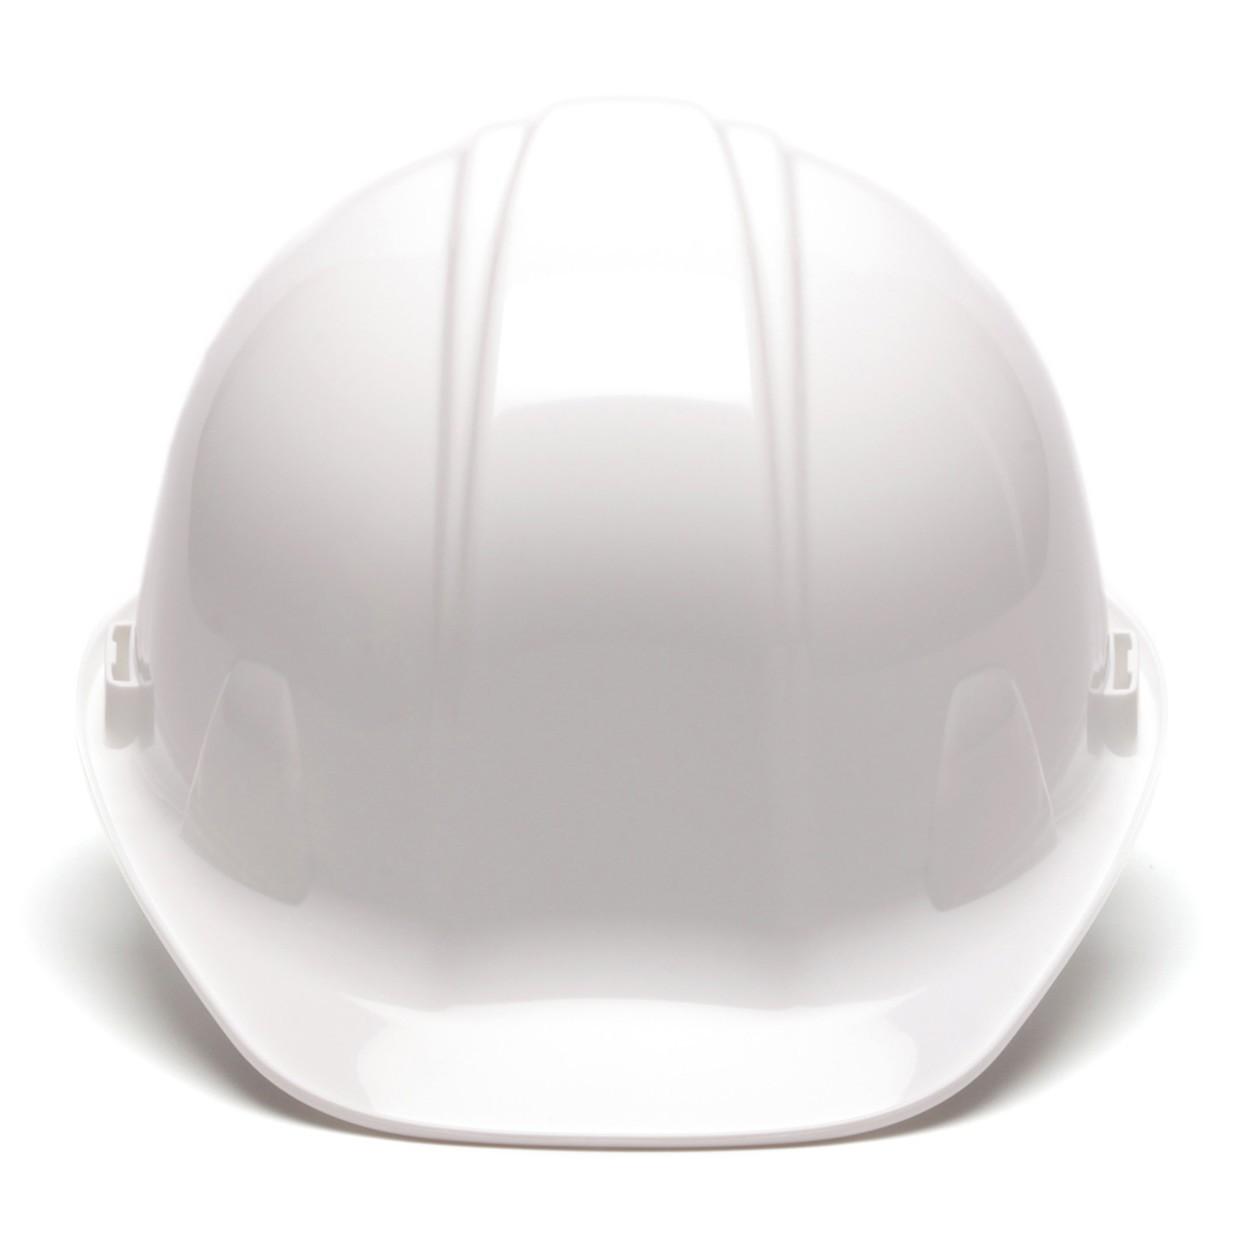 Racing Logos Ideas in addition 14251 also F1 Helmet Designs Liveries besides Pyramex Hp16010 besides Erb Safety 19300. on nascar graphic designer